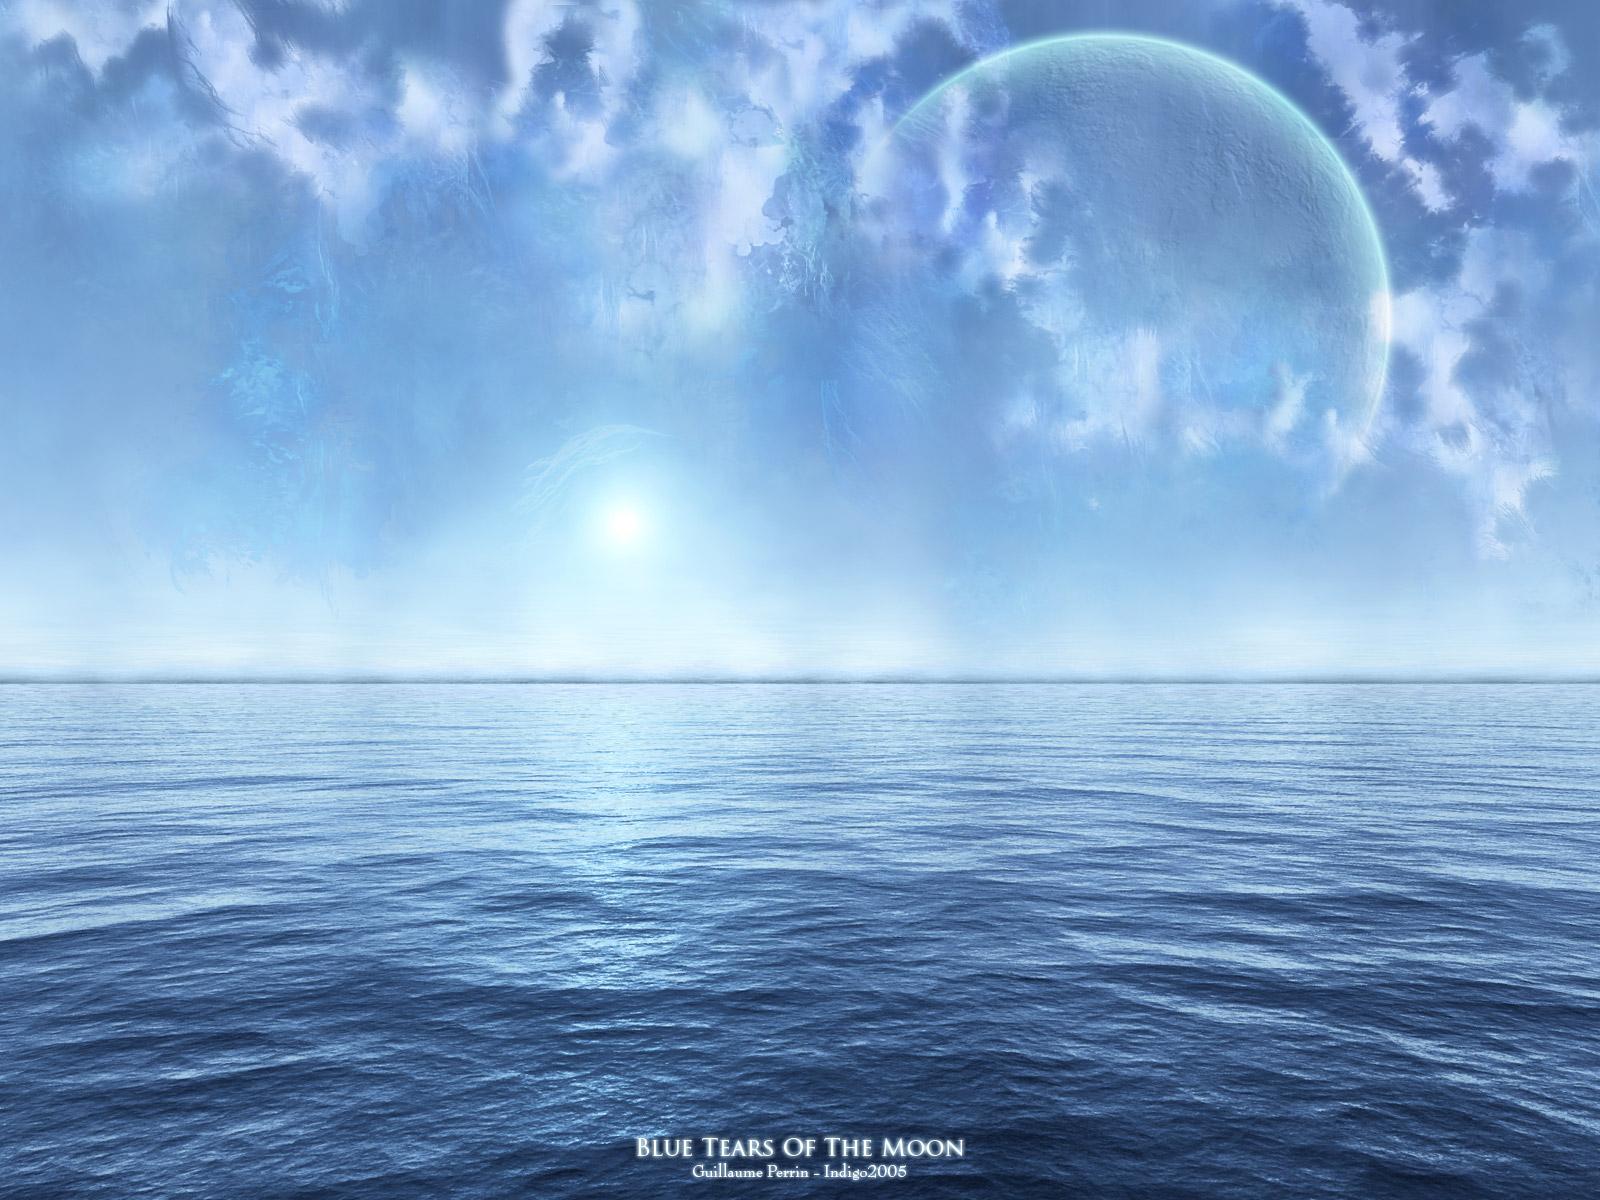 Blue Tears Of The Moon by Indigo2005